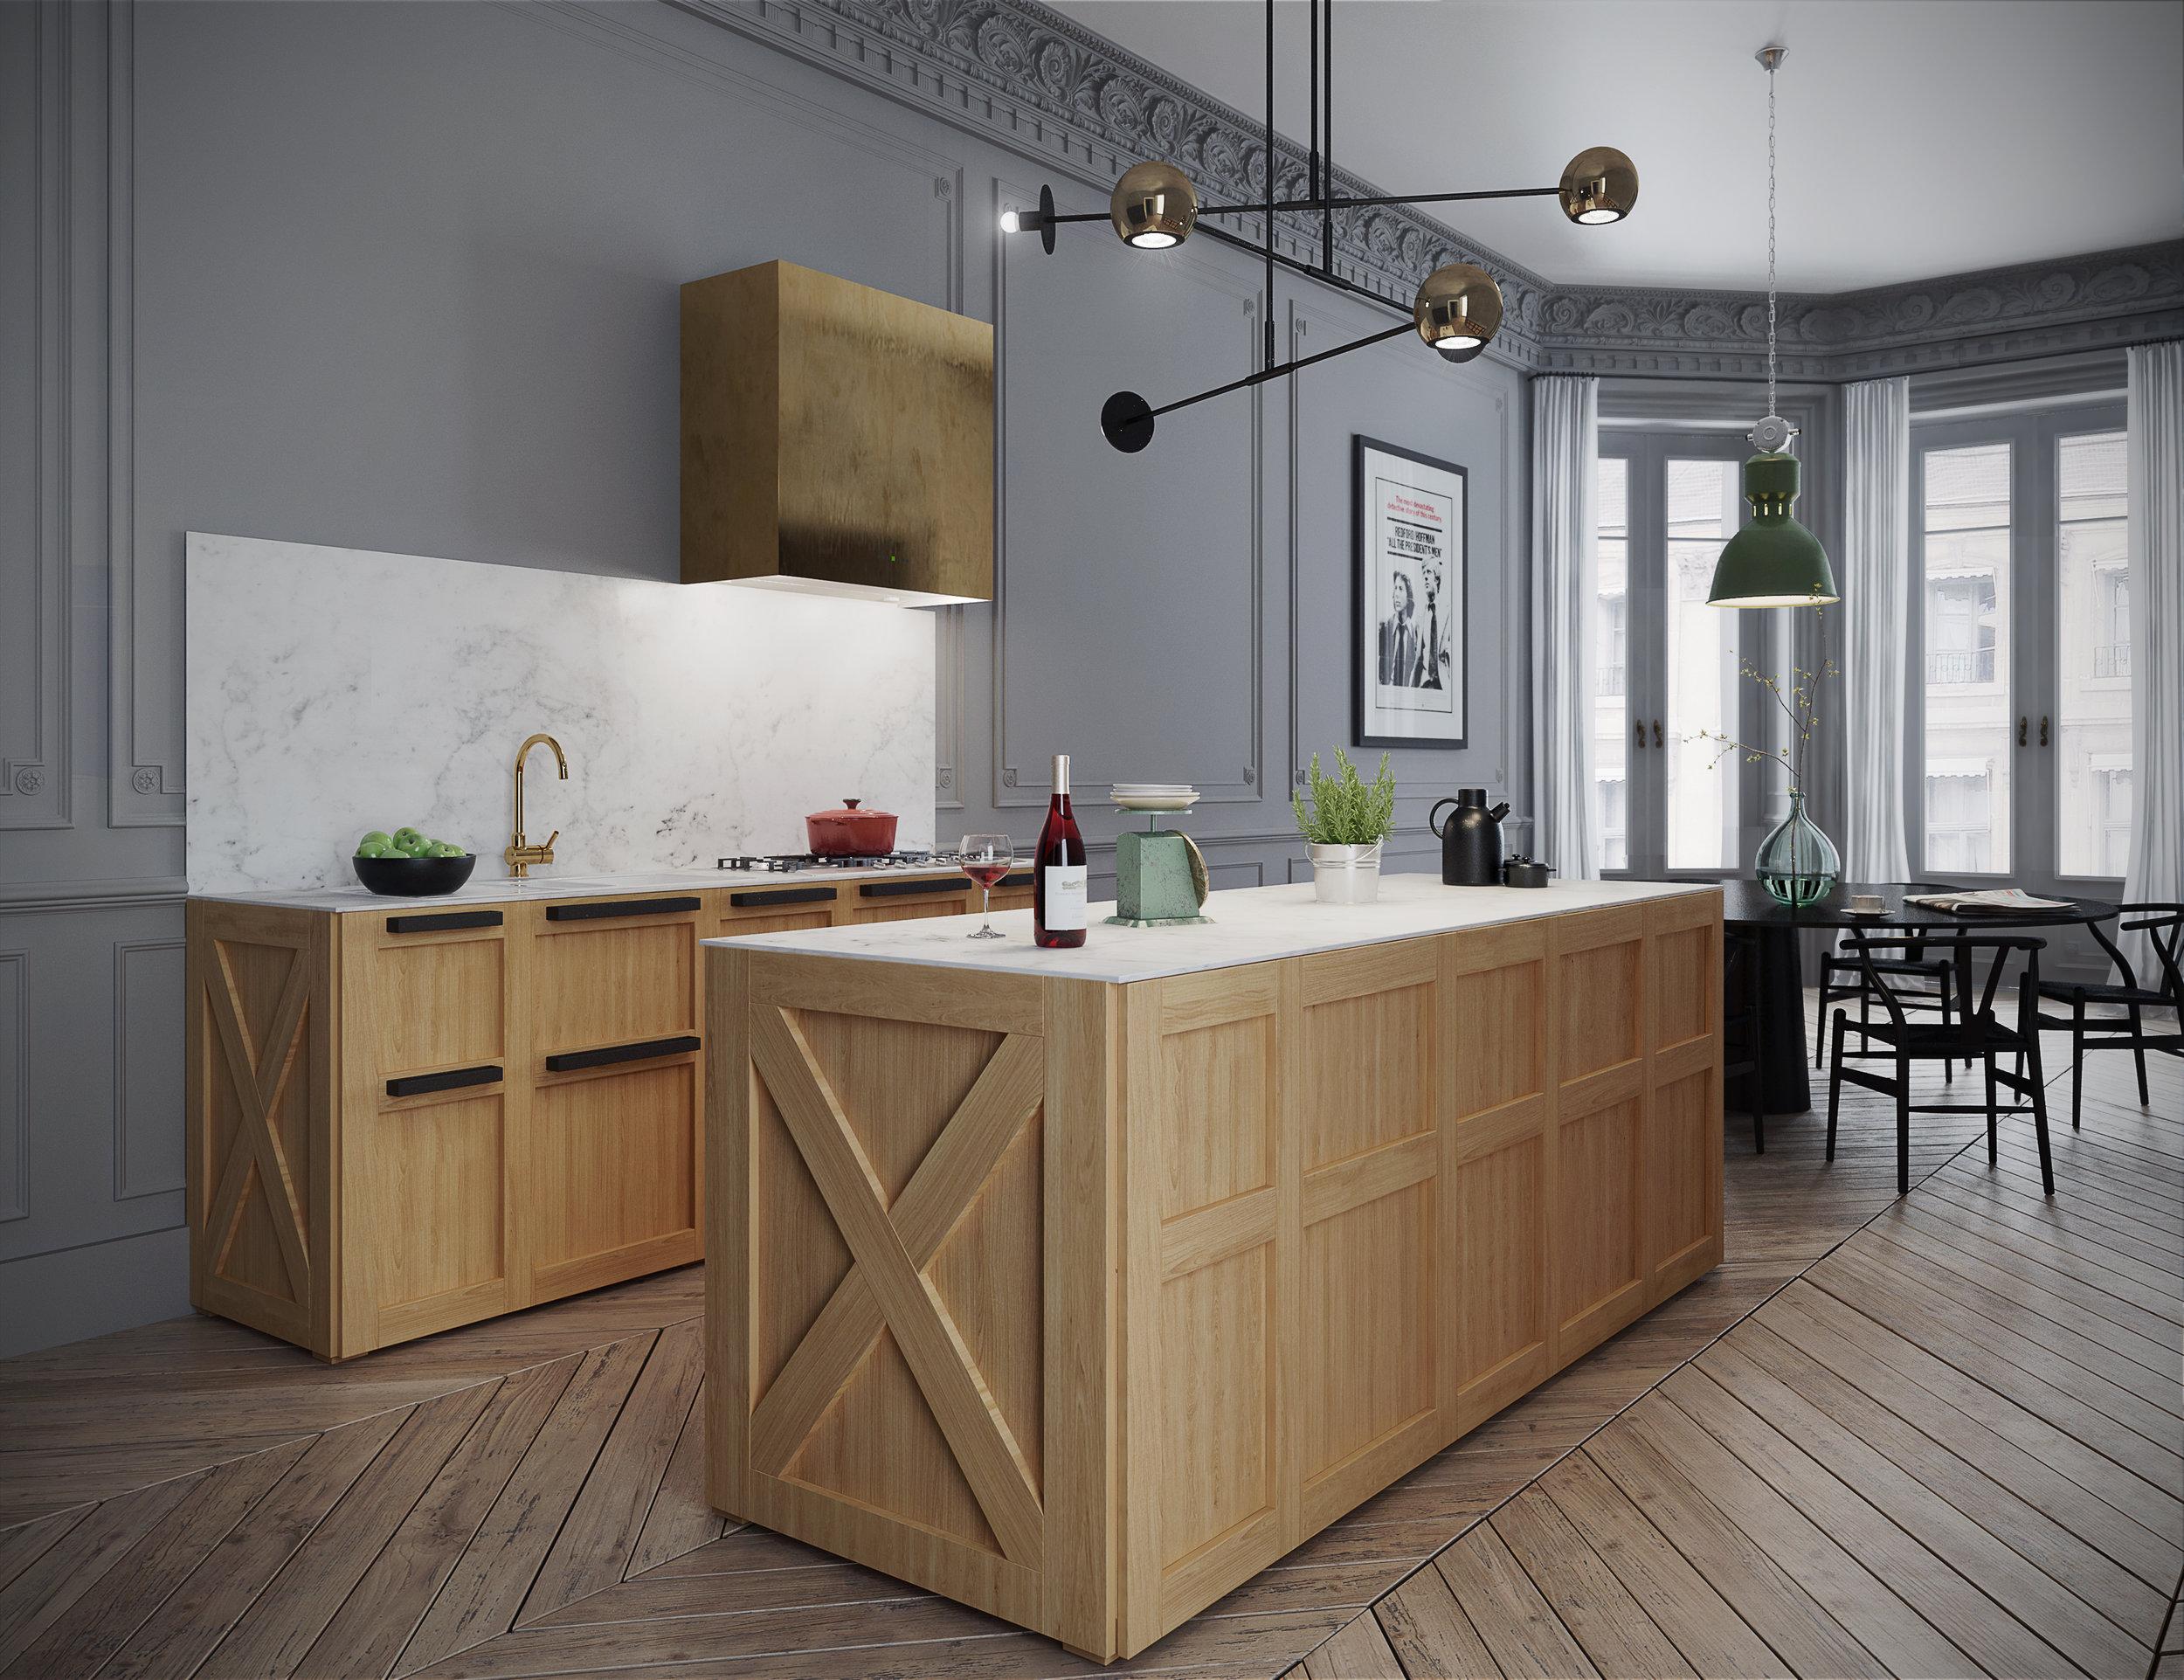 Paris Apartment Interior Design Kitchen Furniture Styling K Box 2.jpg